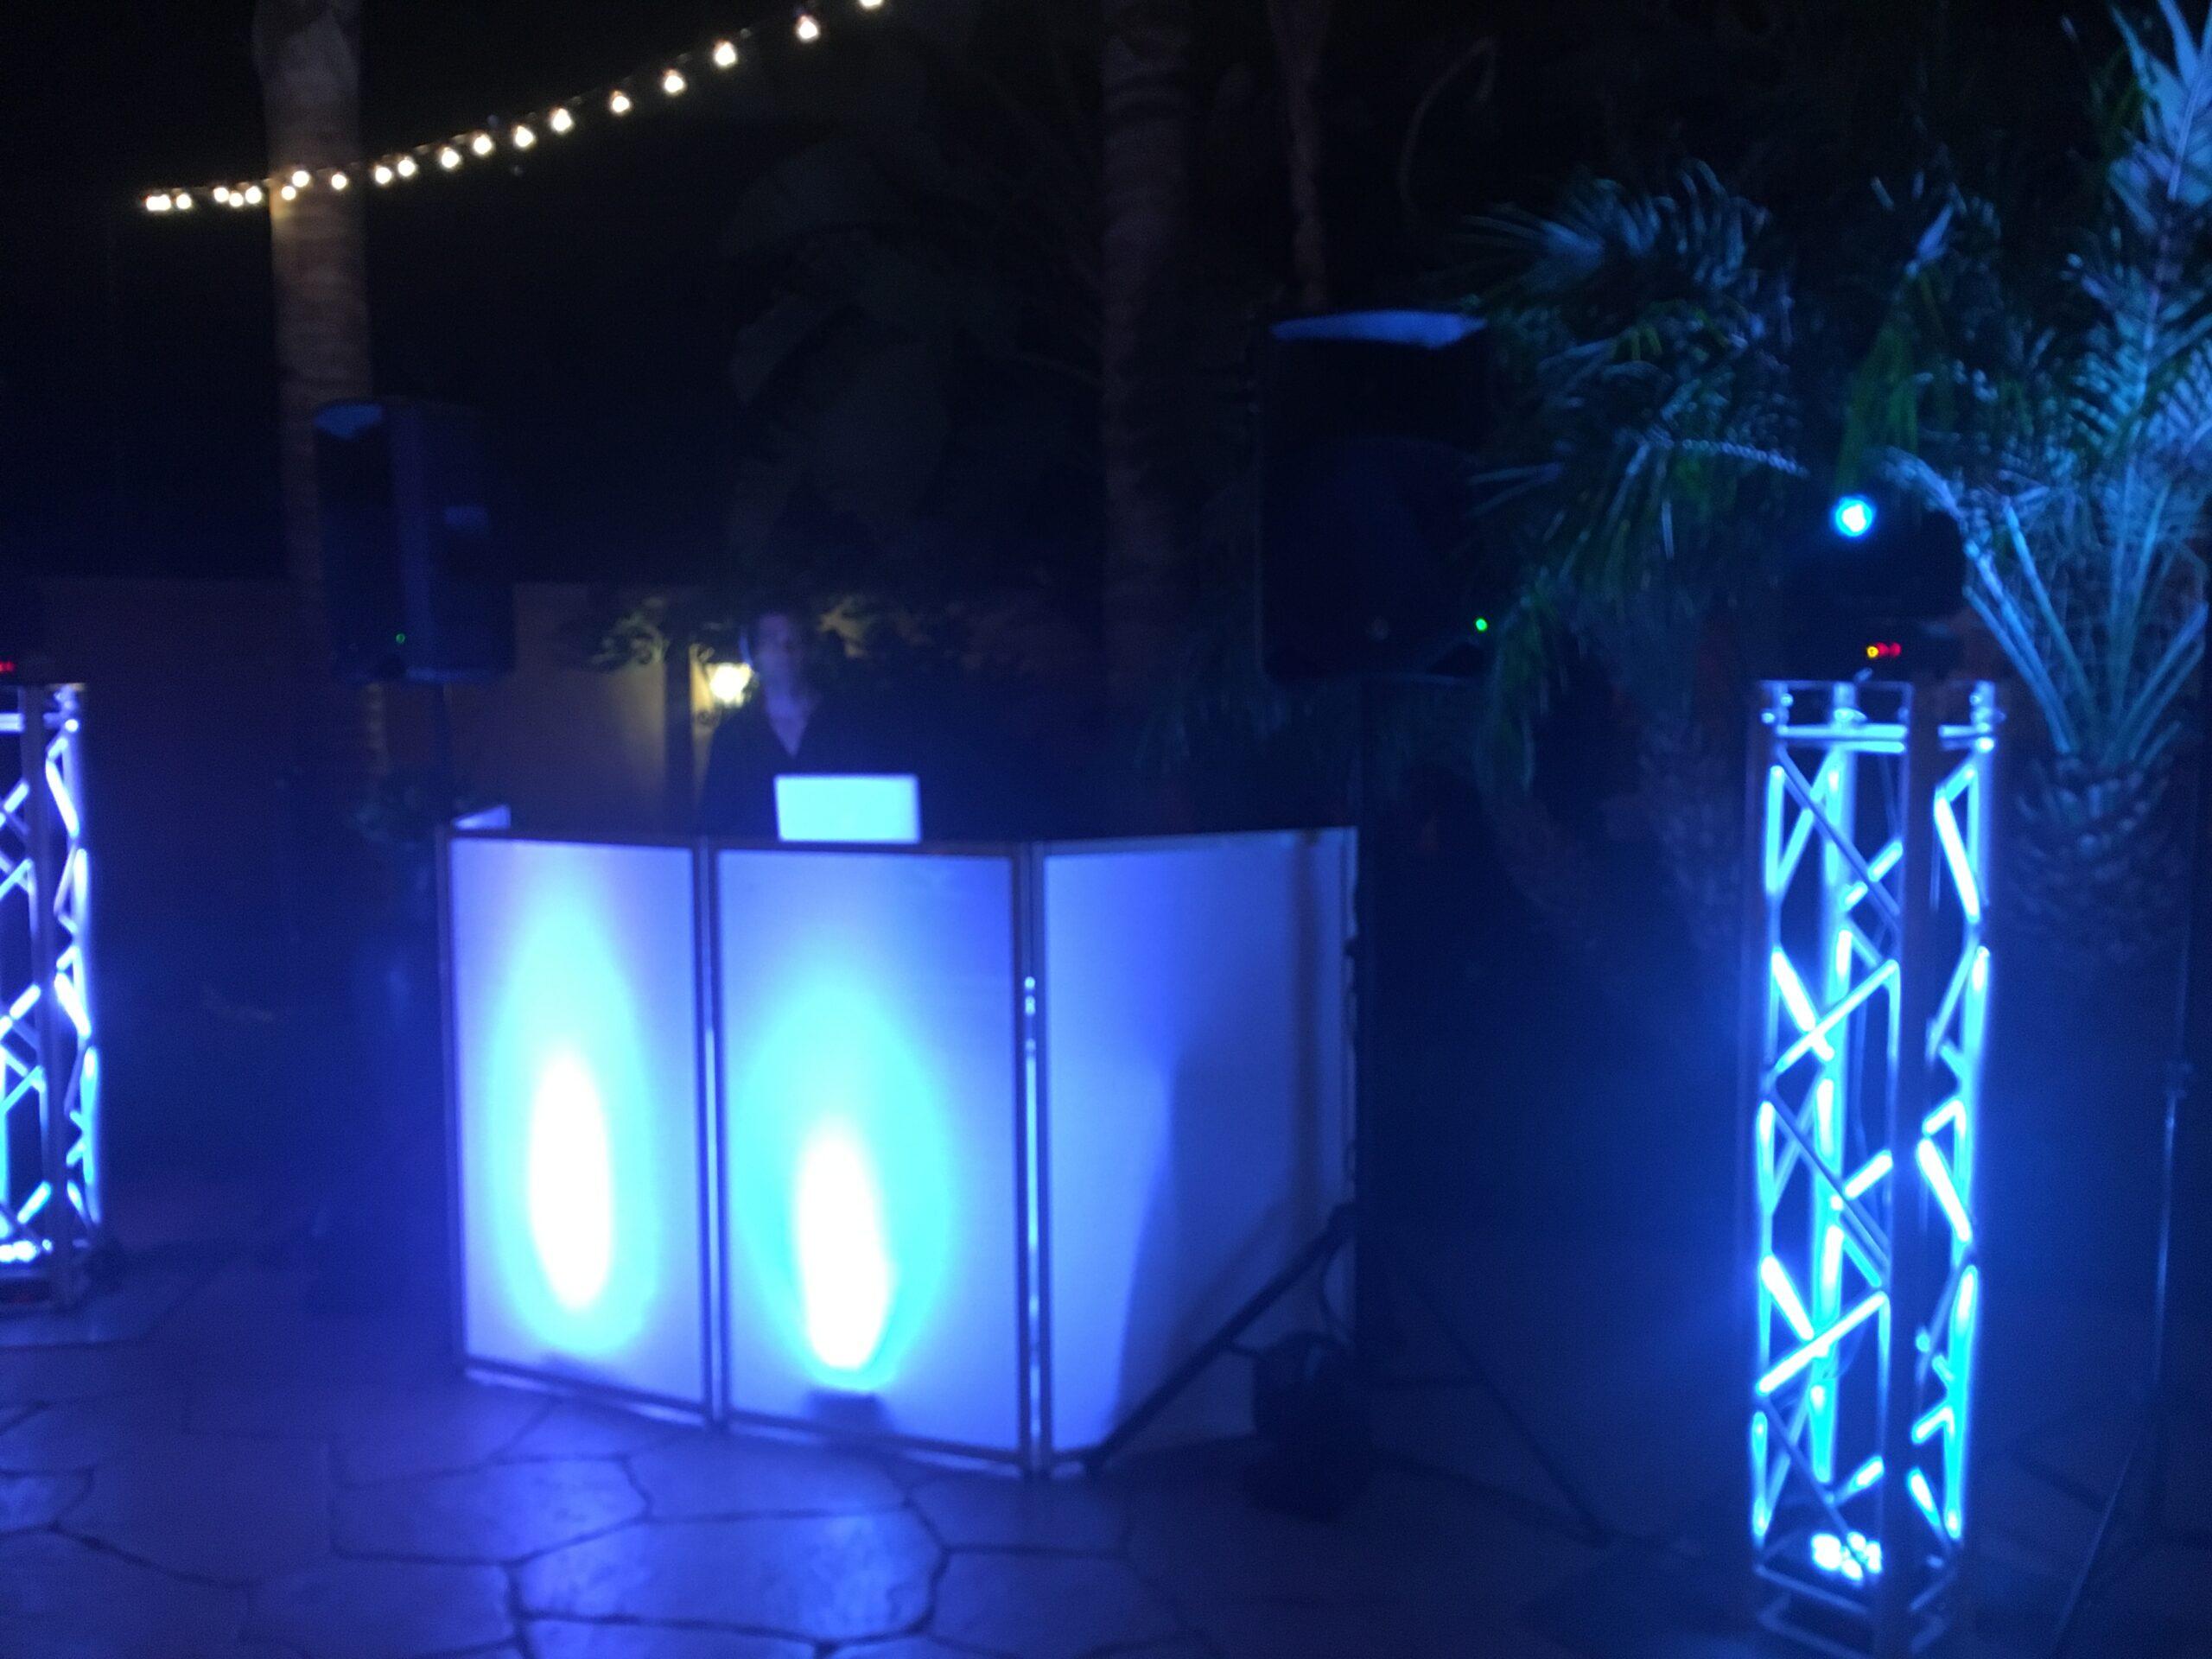 Angels Music Djs, Israeli Wedding DJ, Israeli DJ, Jewish DJ, Jewish wedding DJ, Party DJ, Wedding DJ Los Angeles, Bar Mitzvah DJ, MC, EmCee Bar Mitzvah, Party Motivator Los Angeles